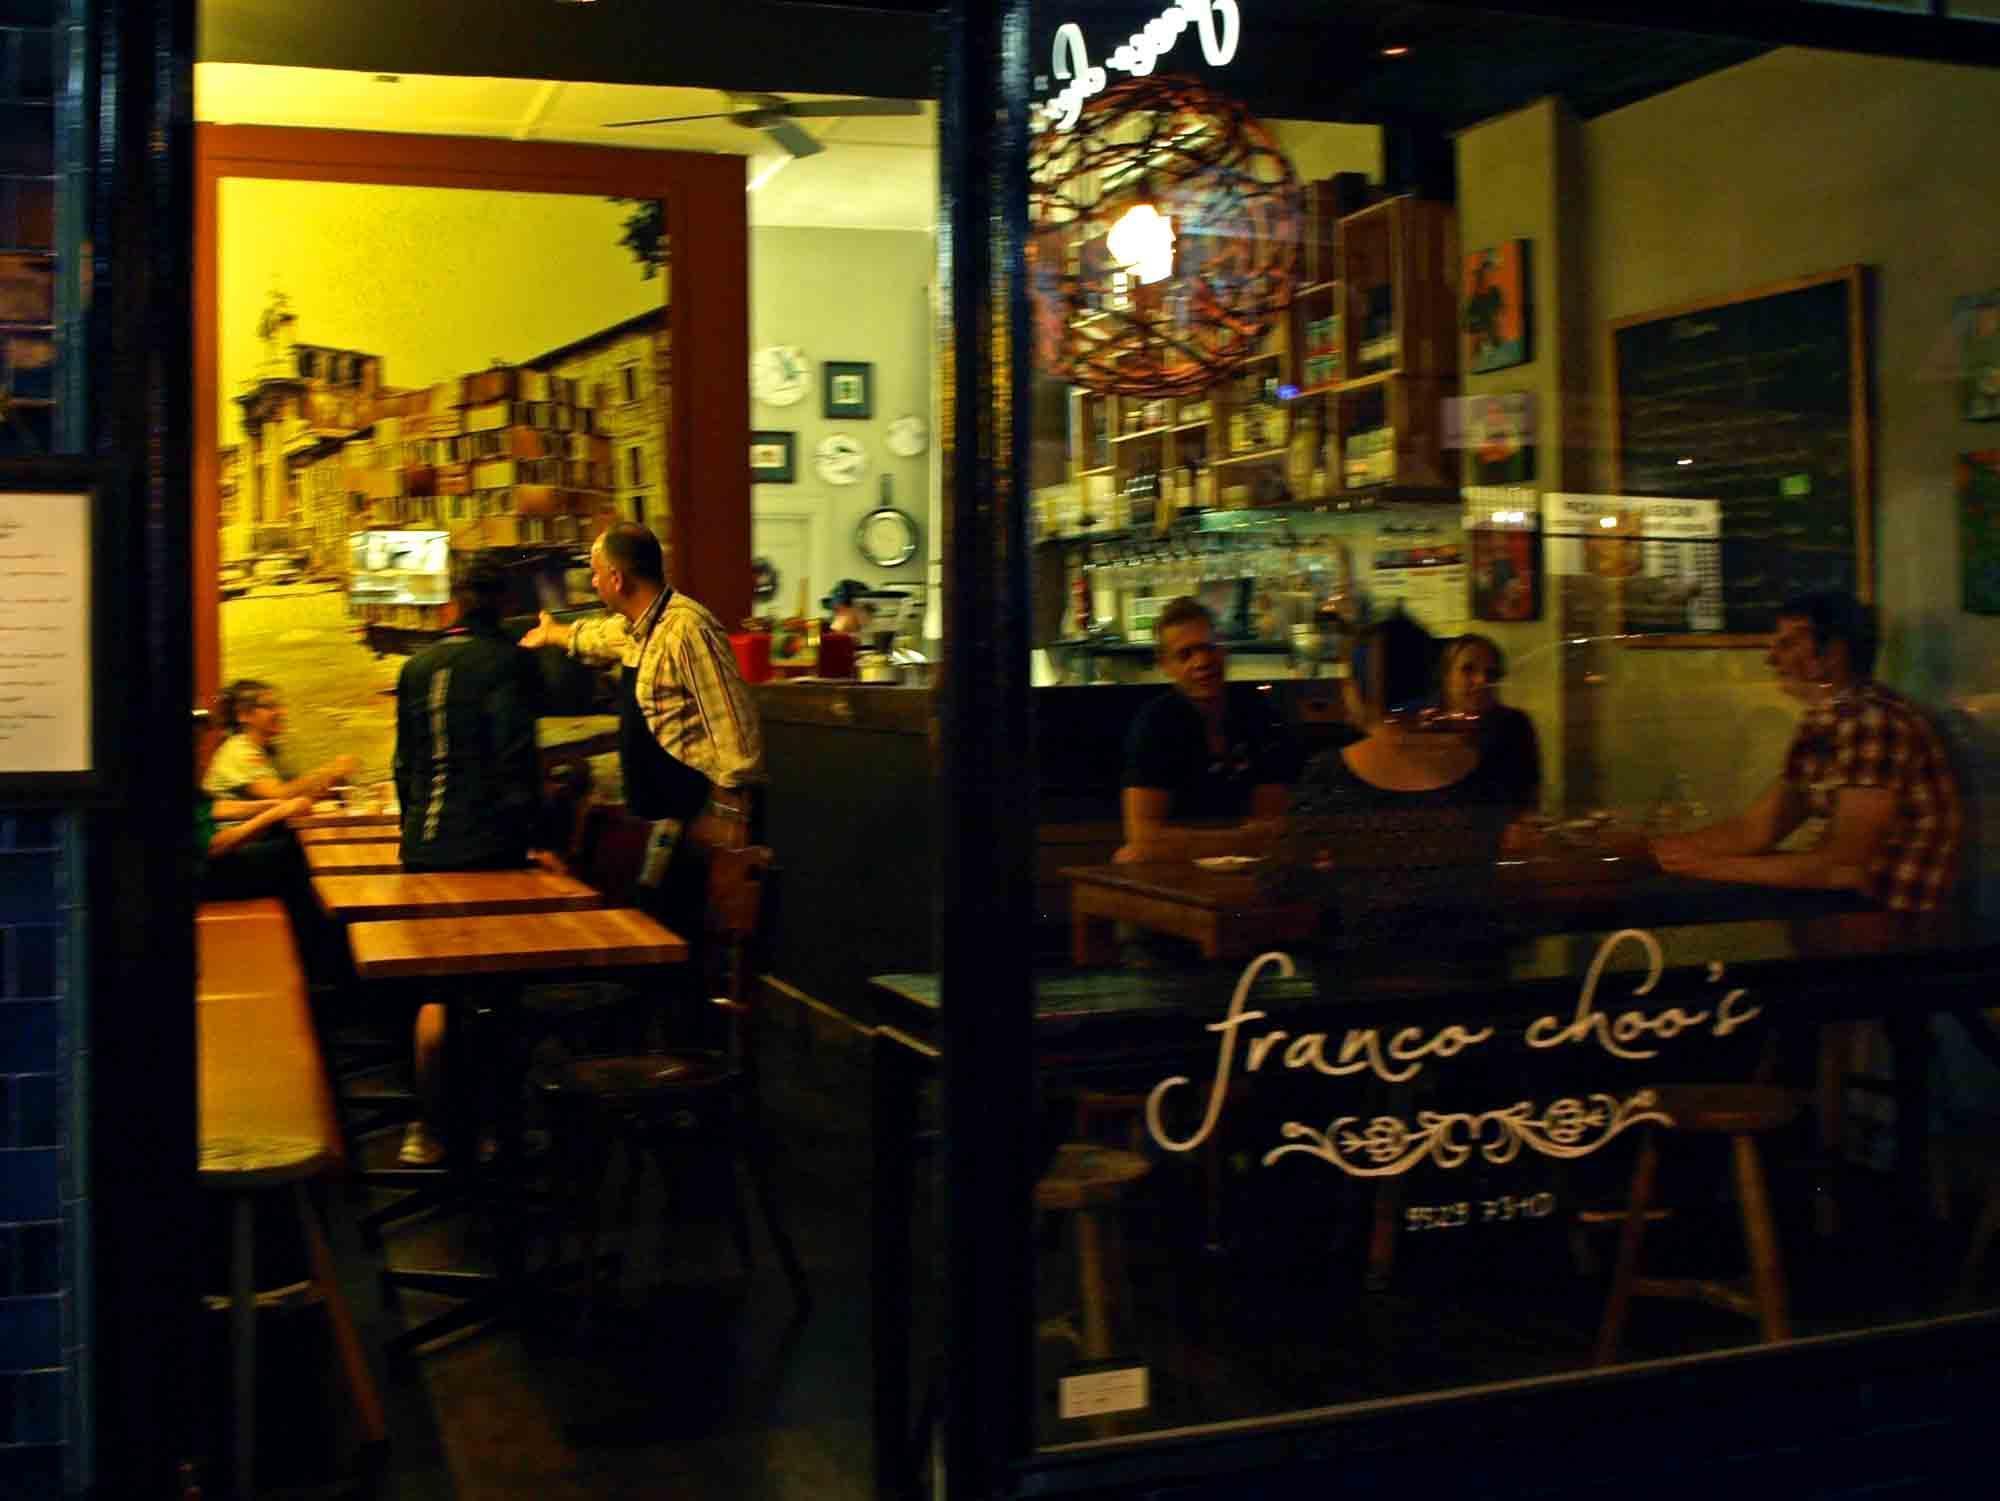 Franco Choo's – Rustic Italian Dining